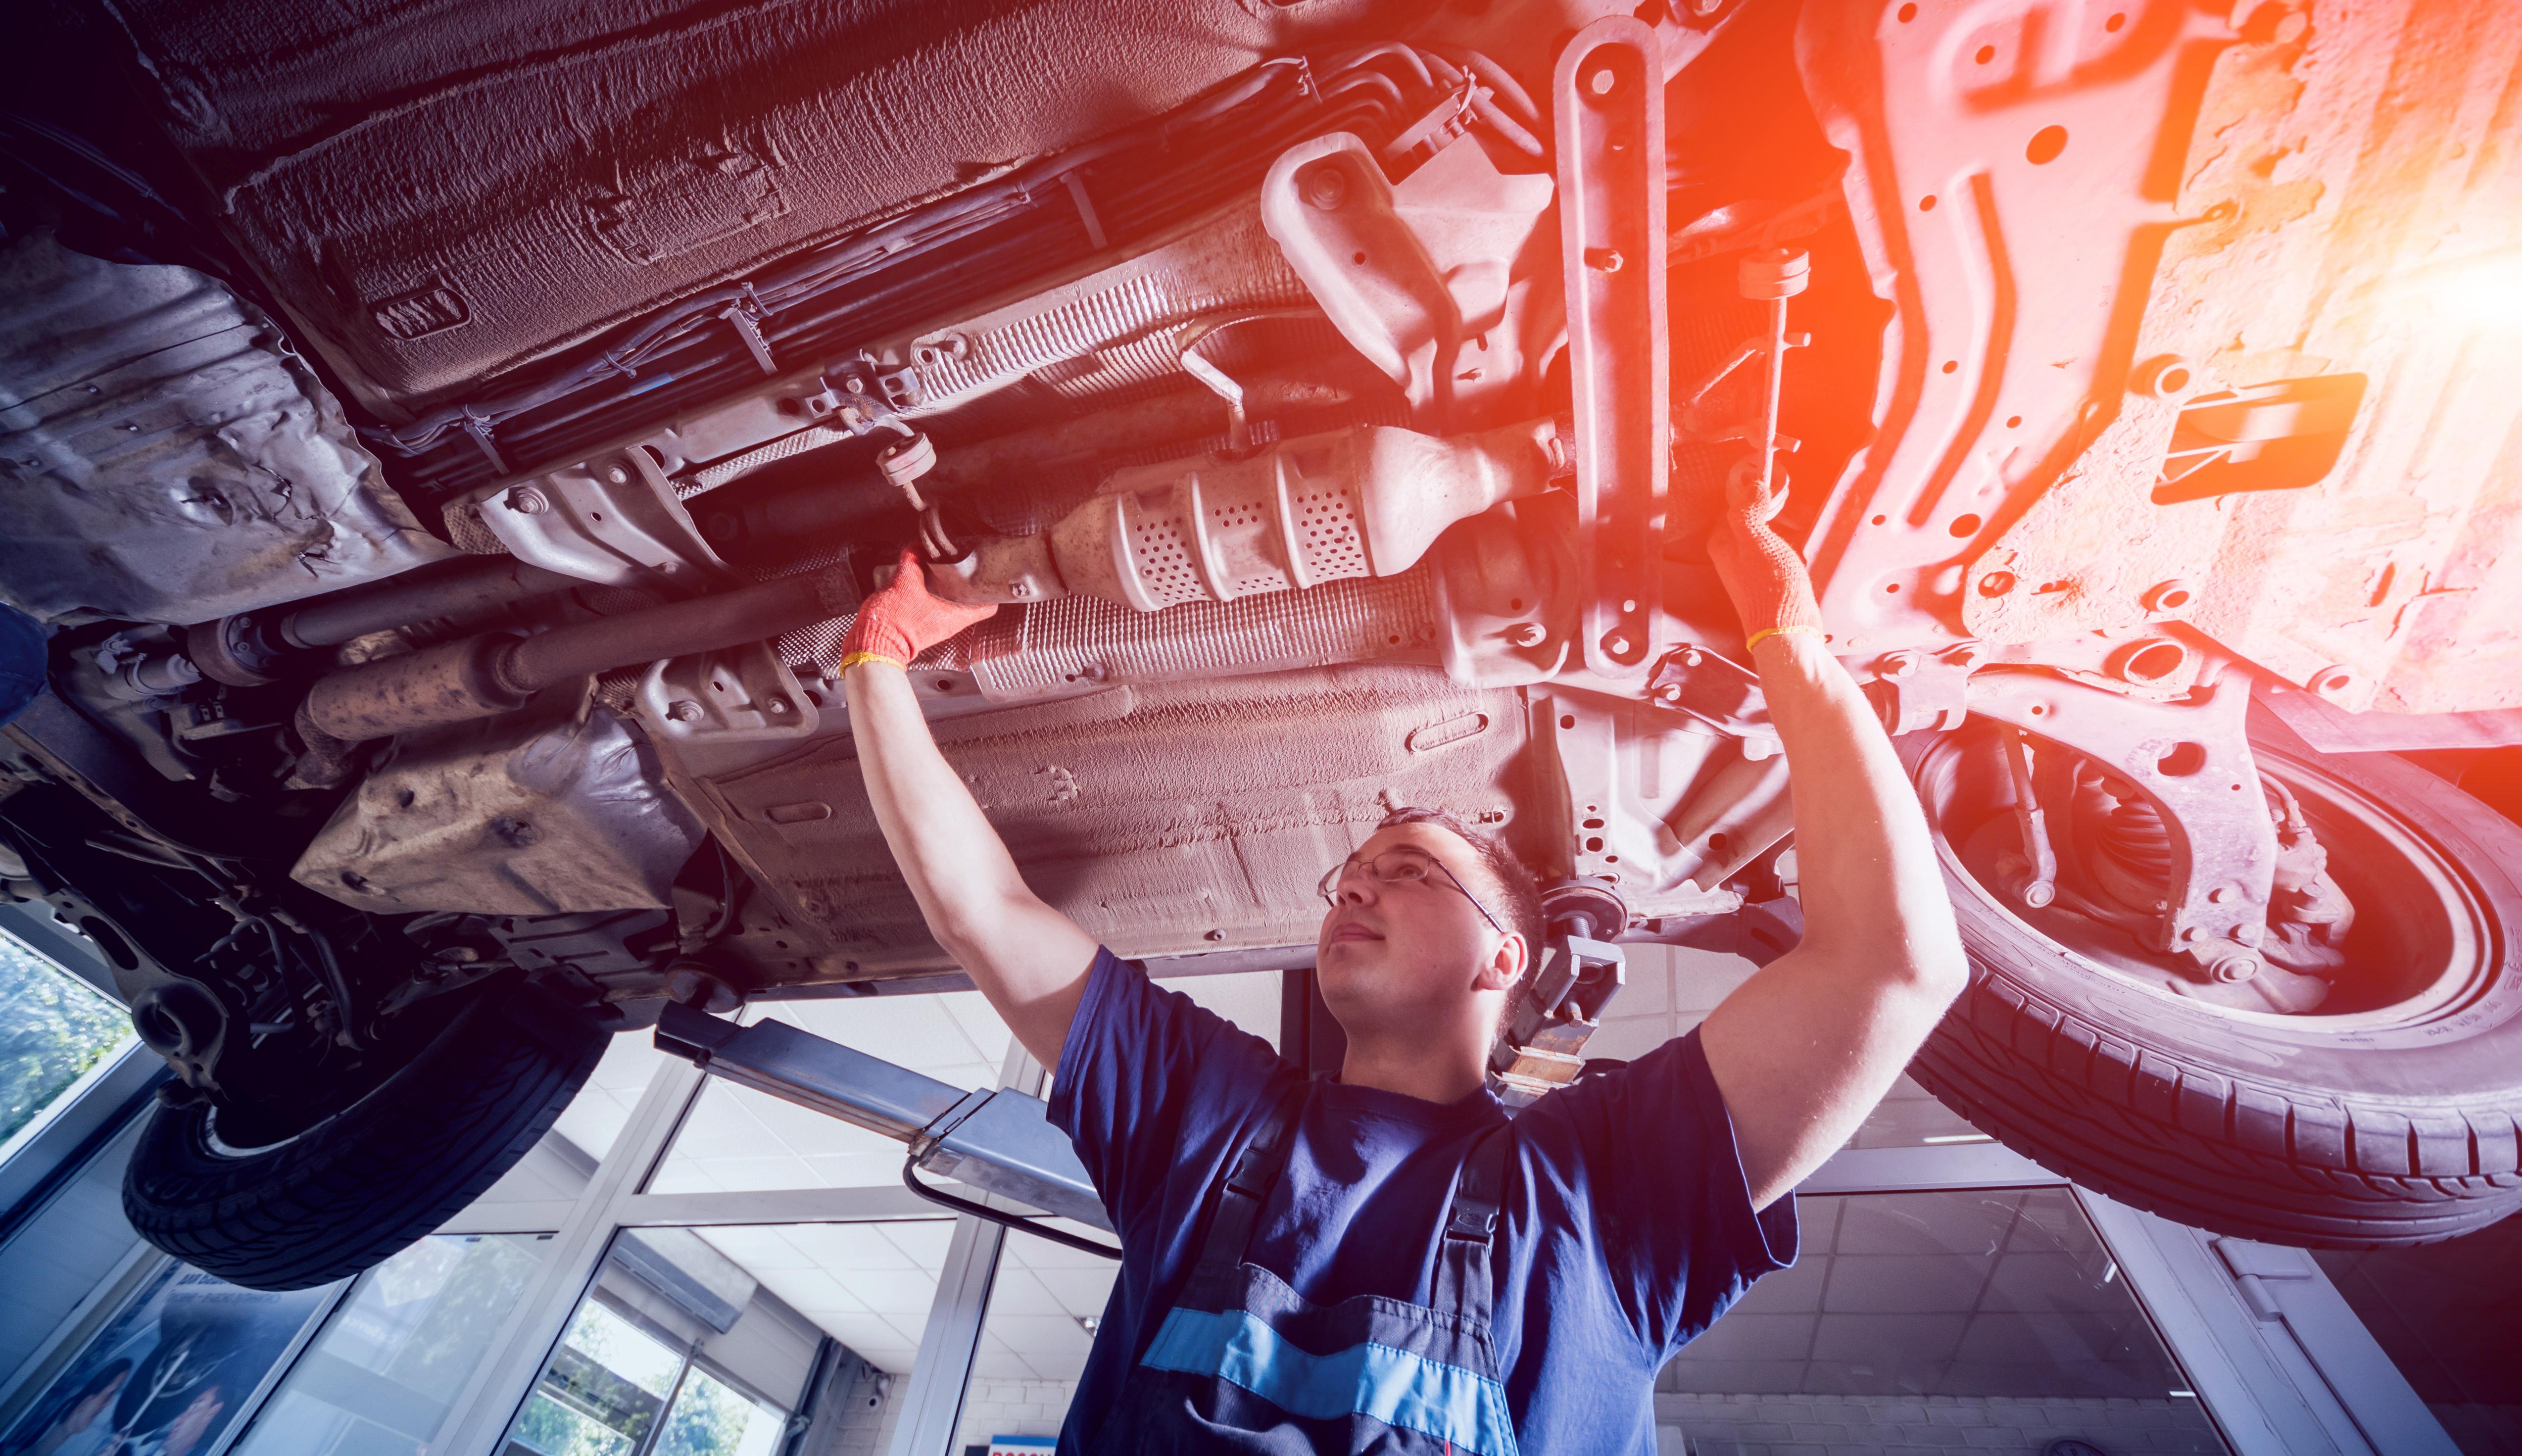 Car mechanic repair car suspension of lifted automobile at repair service station